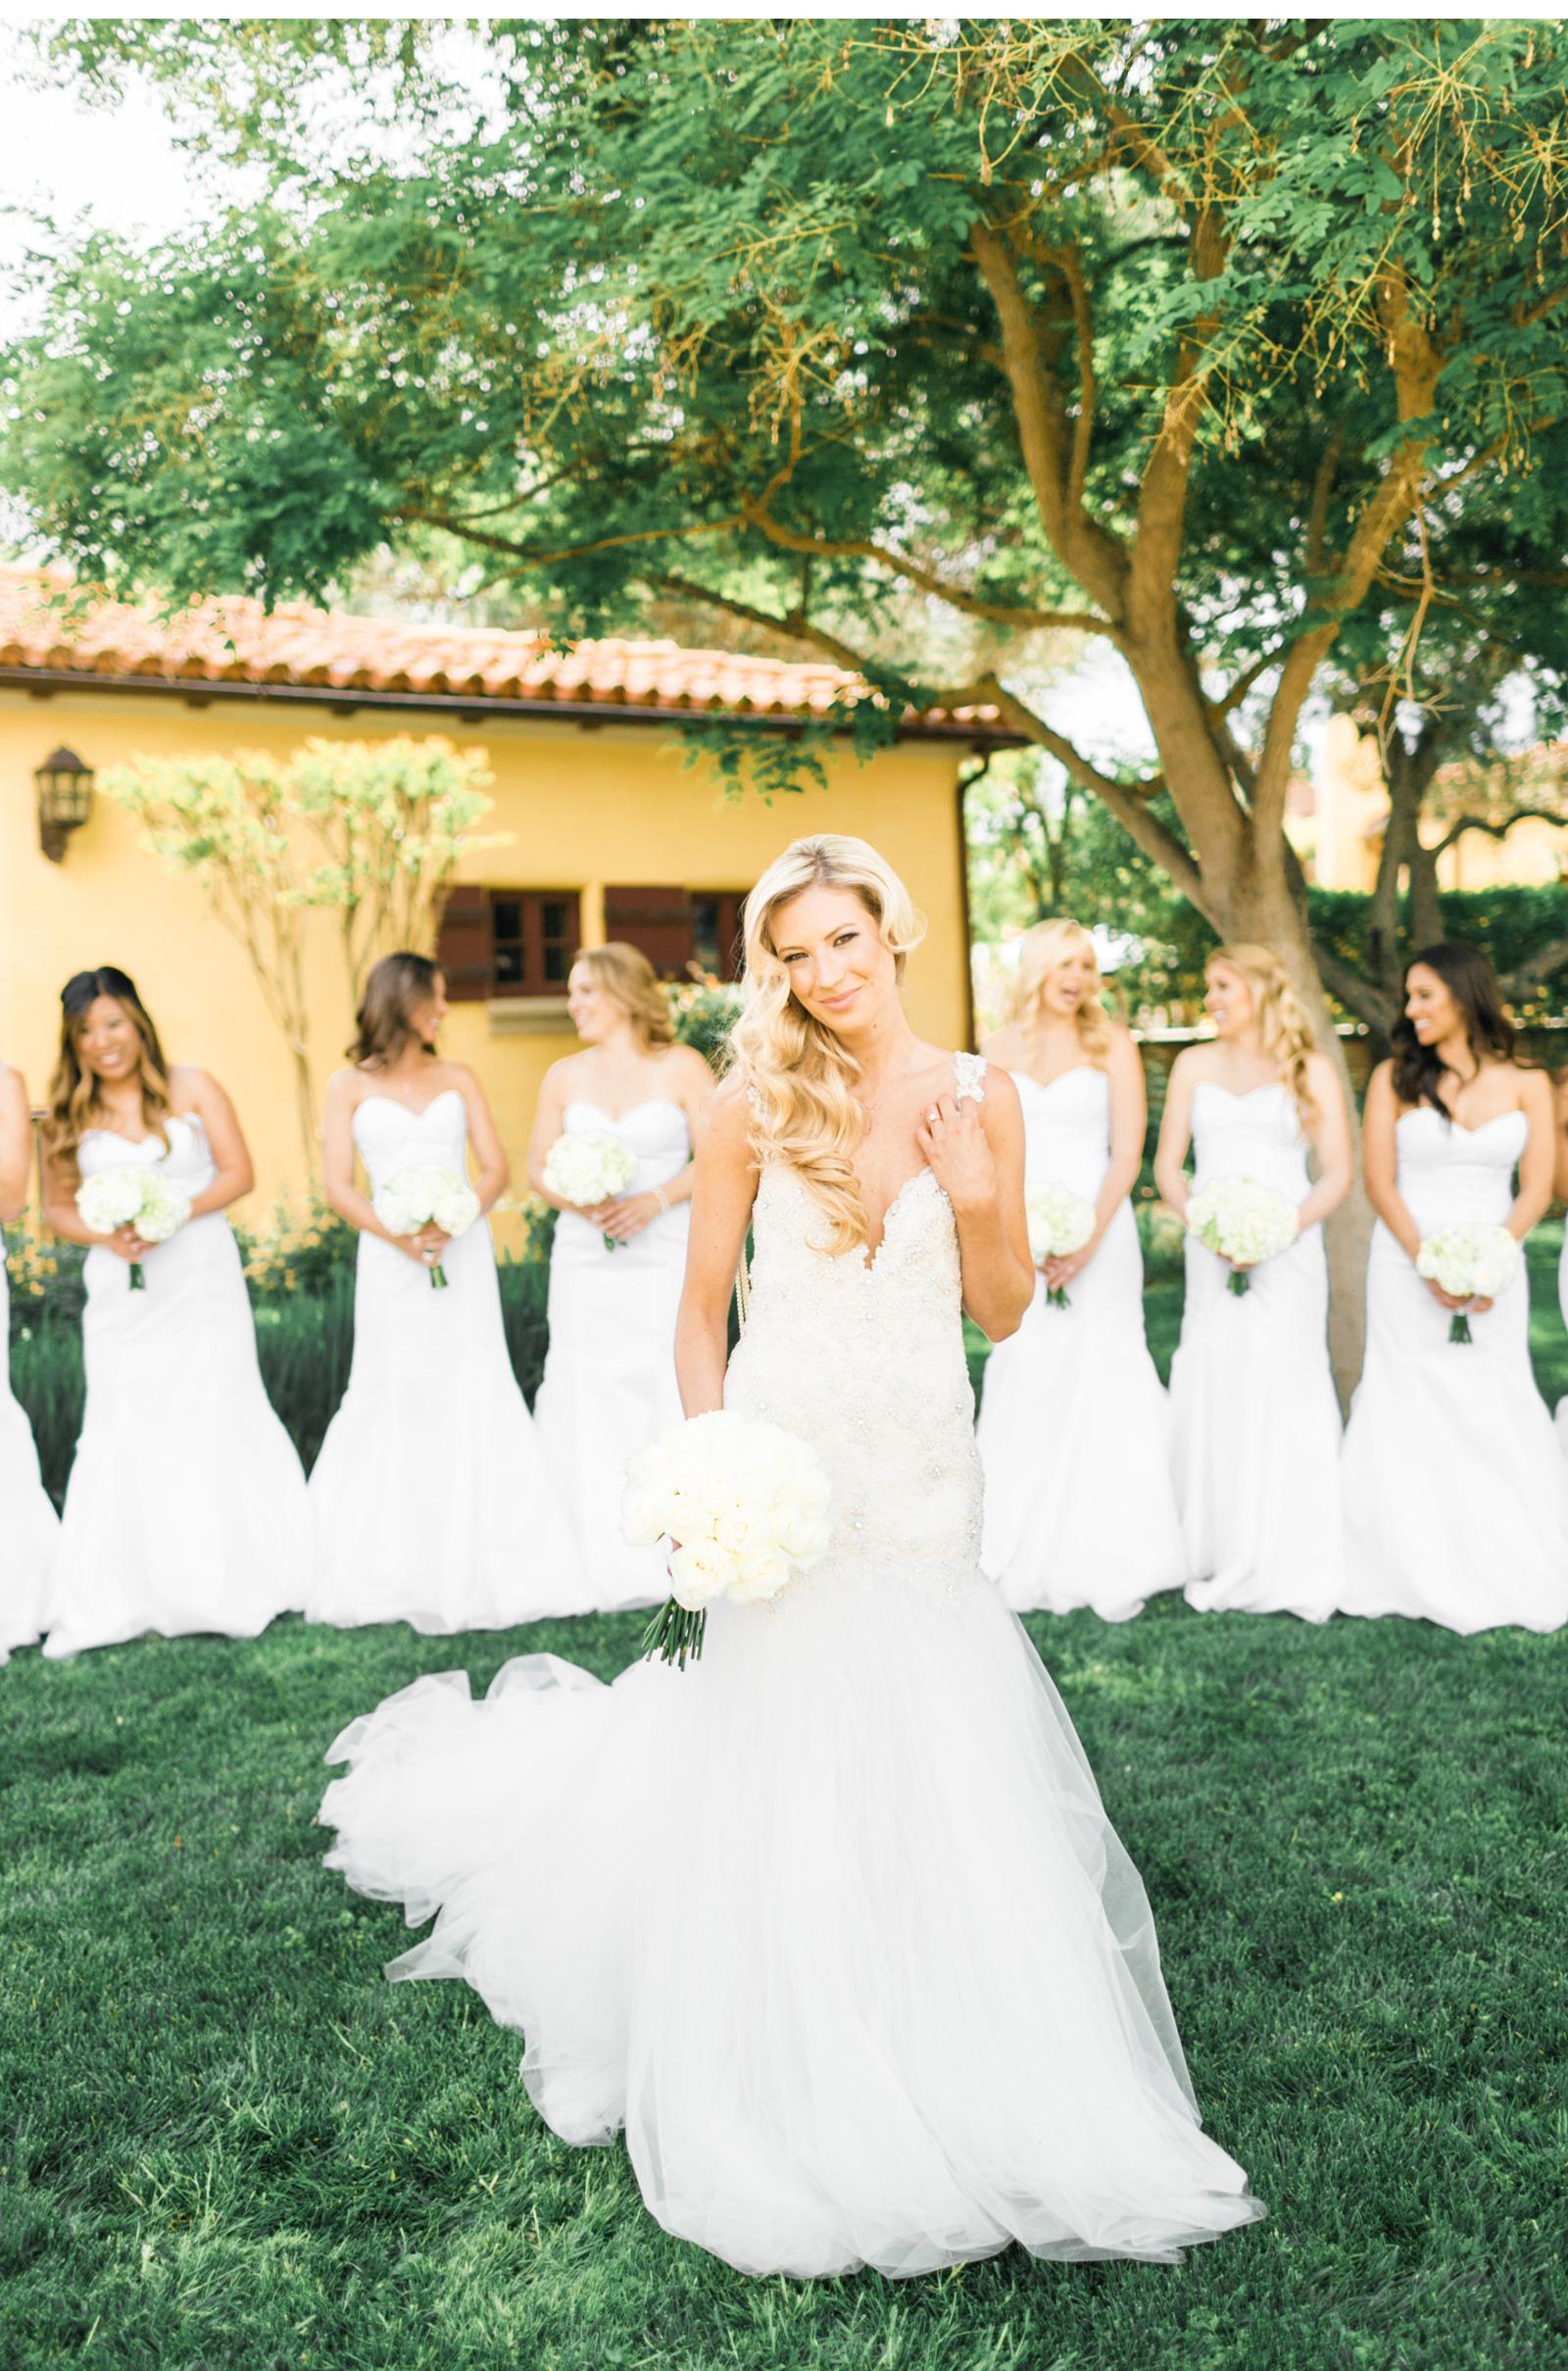 Santa-Barbara-Wedding-Photographer-Natalie-Schutt-Photography_01.jpg